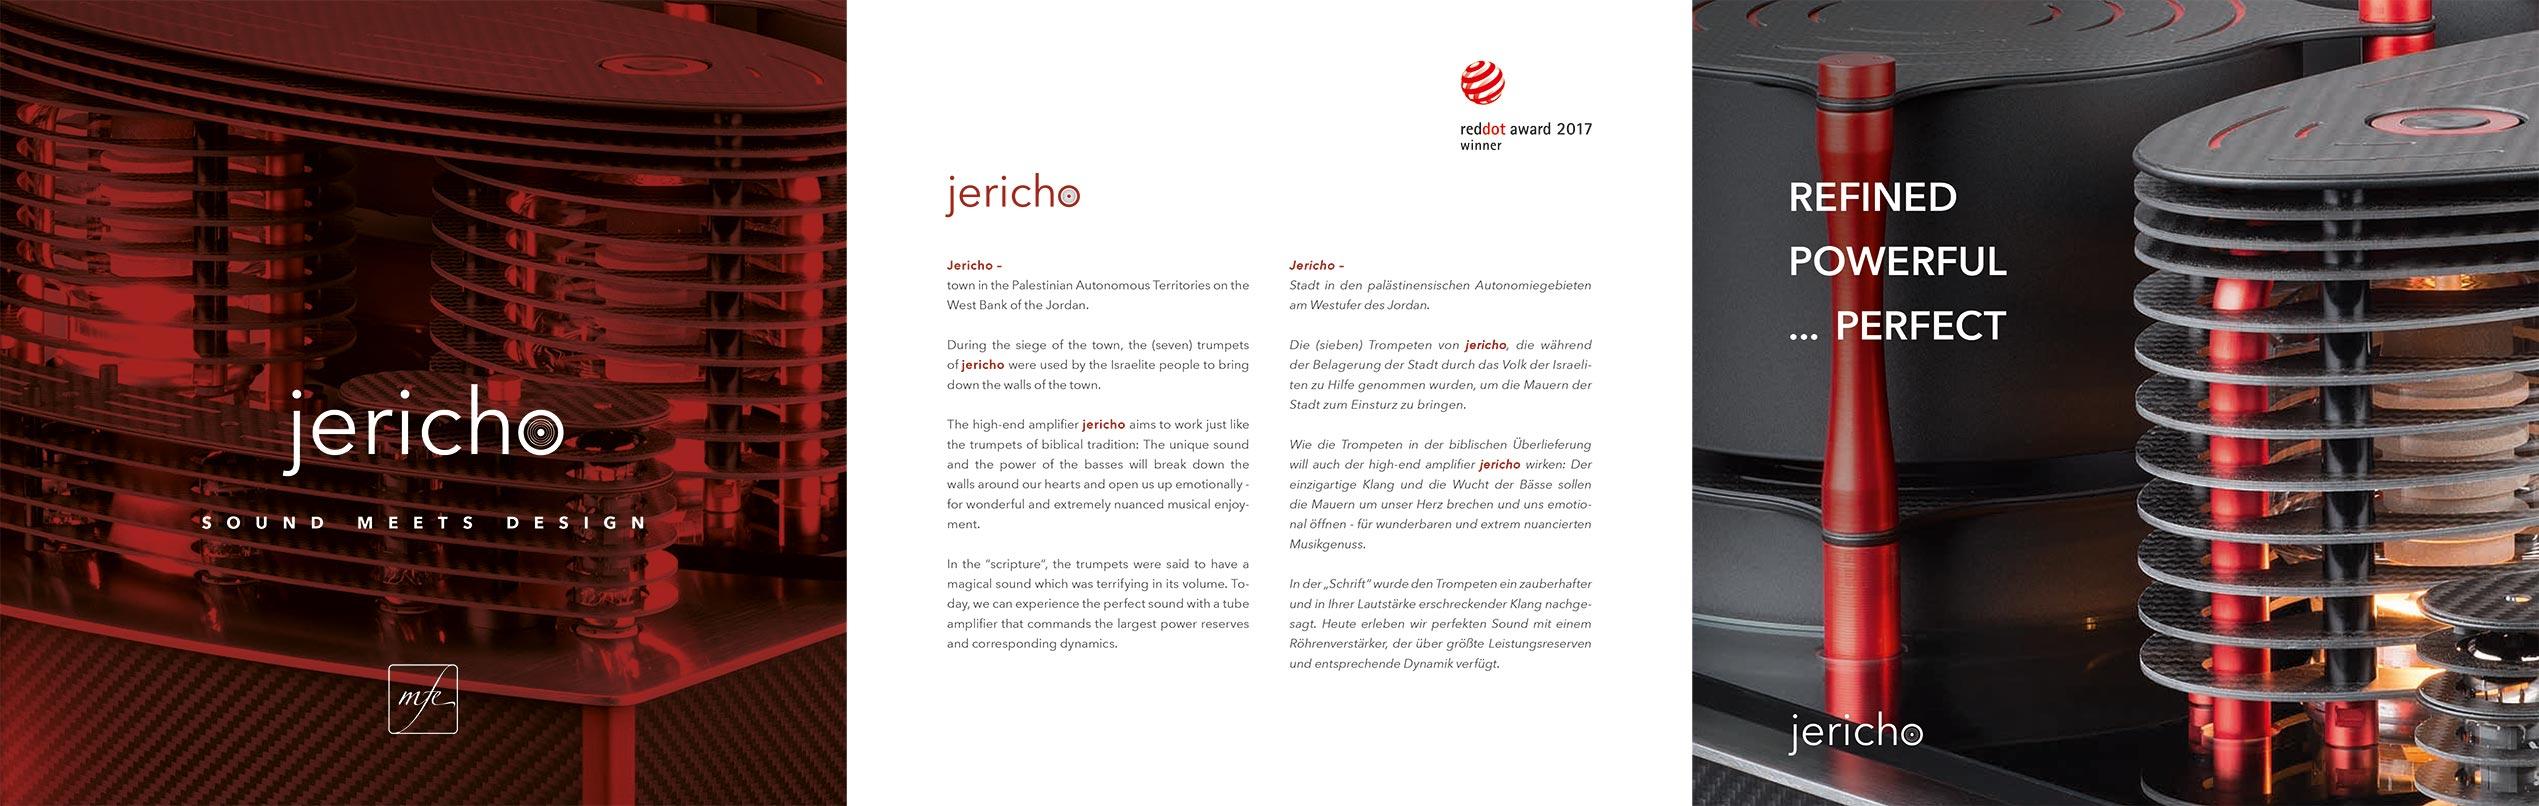 Jericho Broschüre als PDF